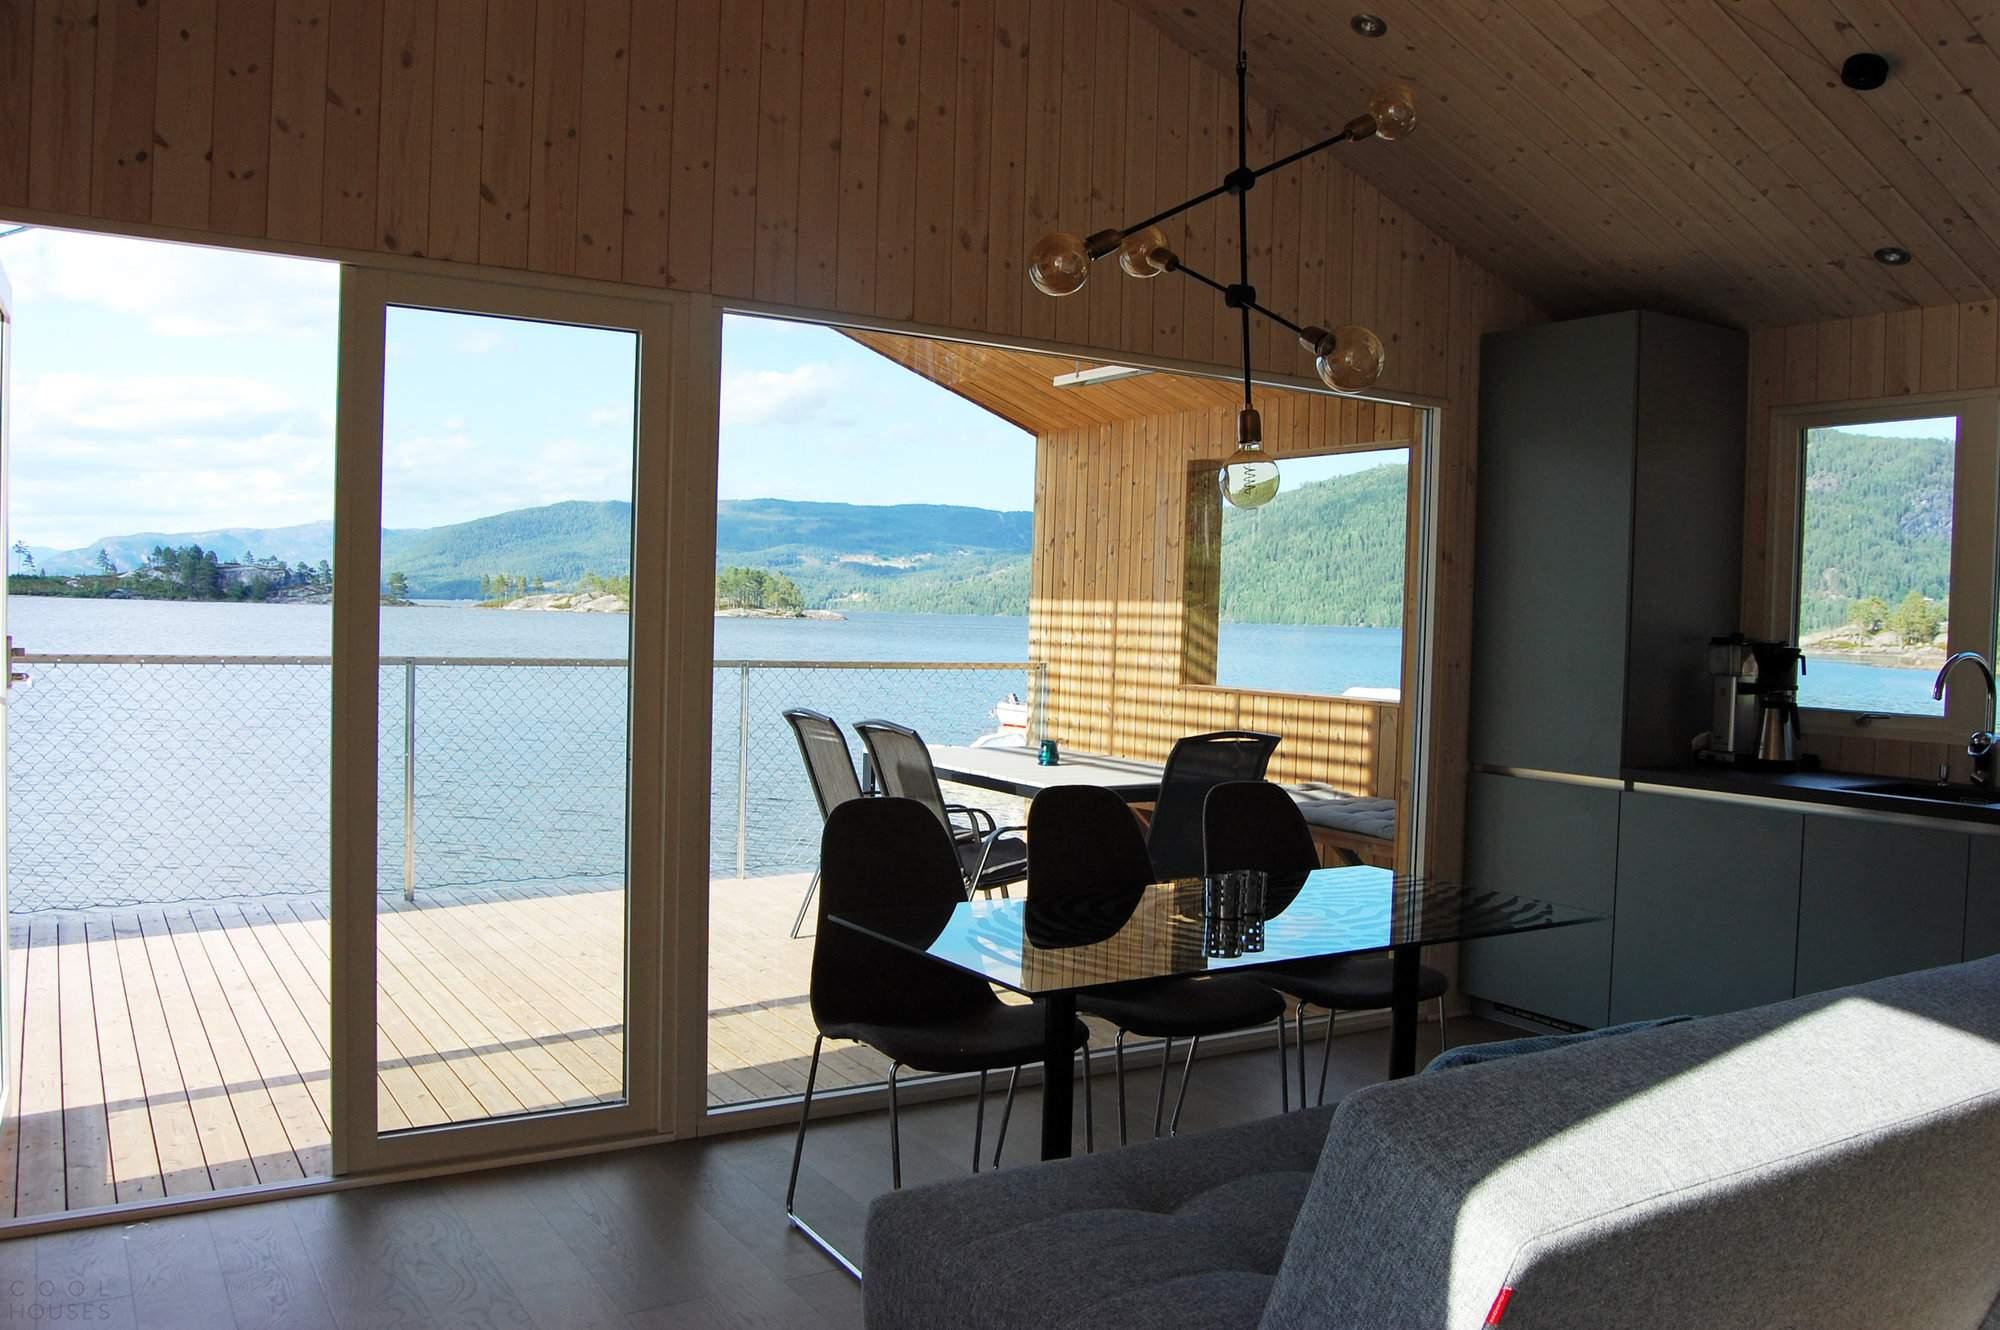 «Плавающий дом» на озере в Норвегии